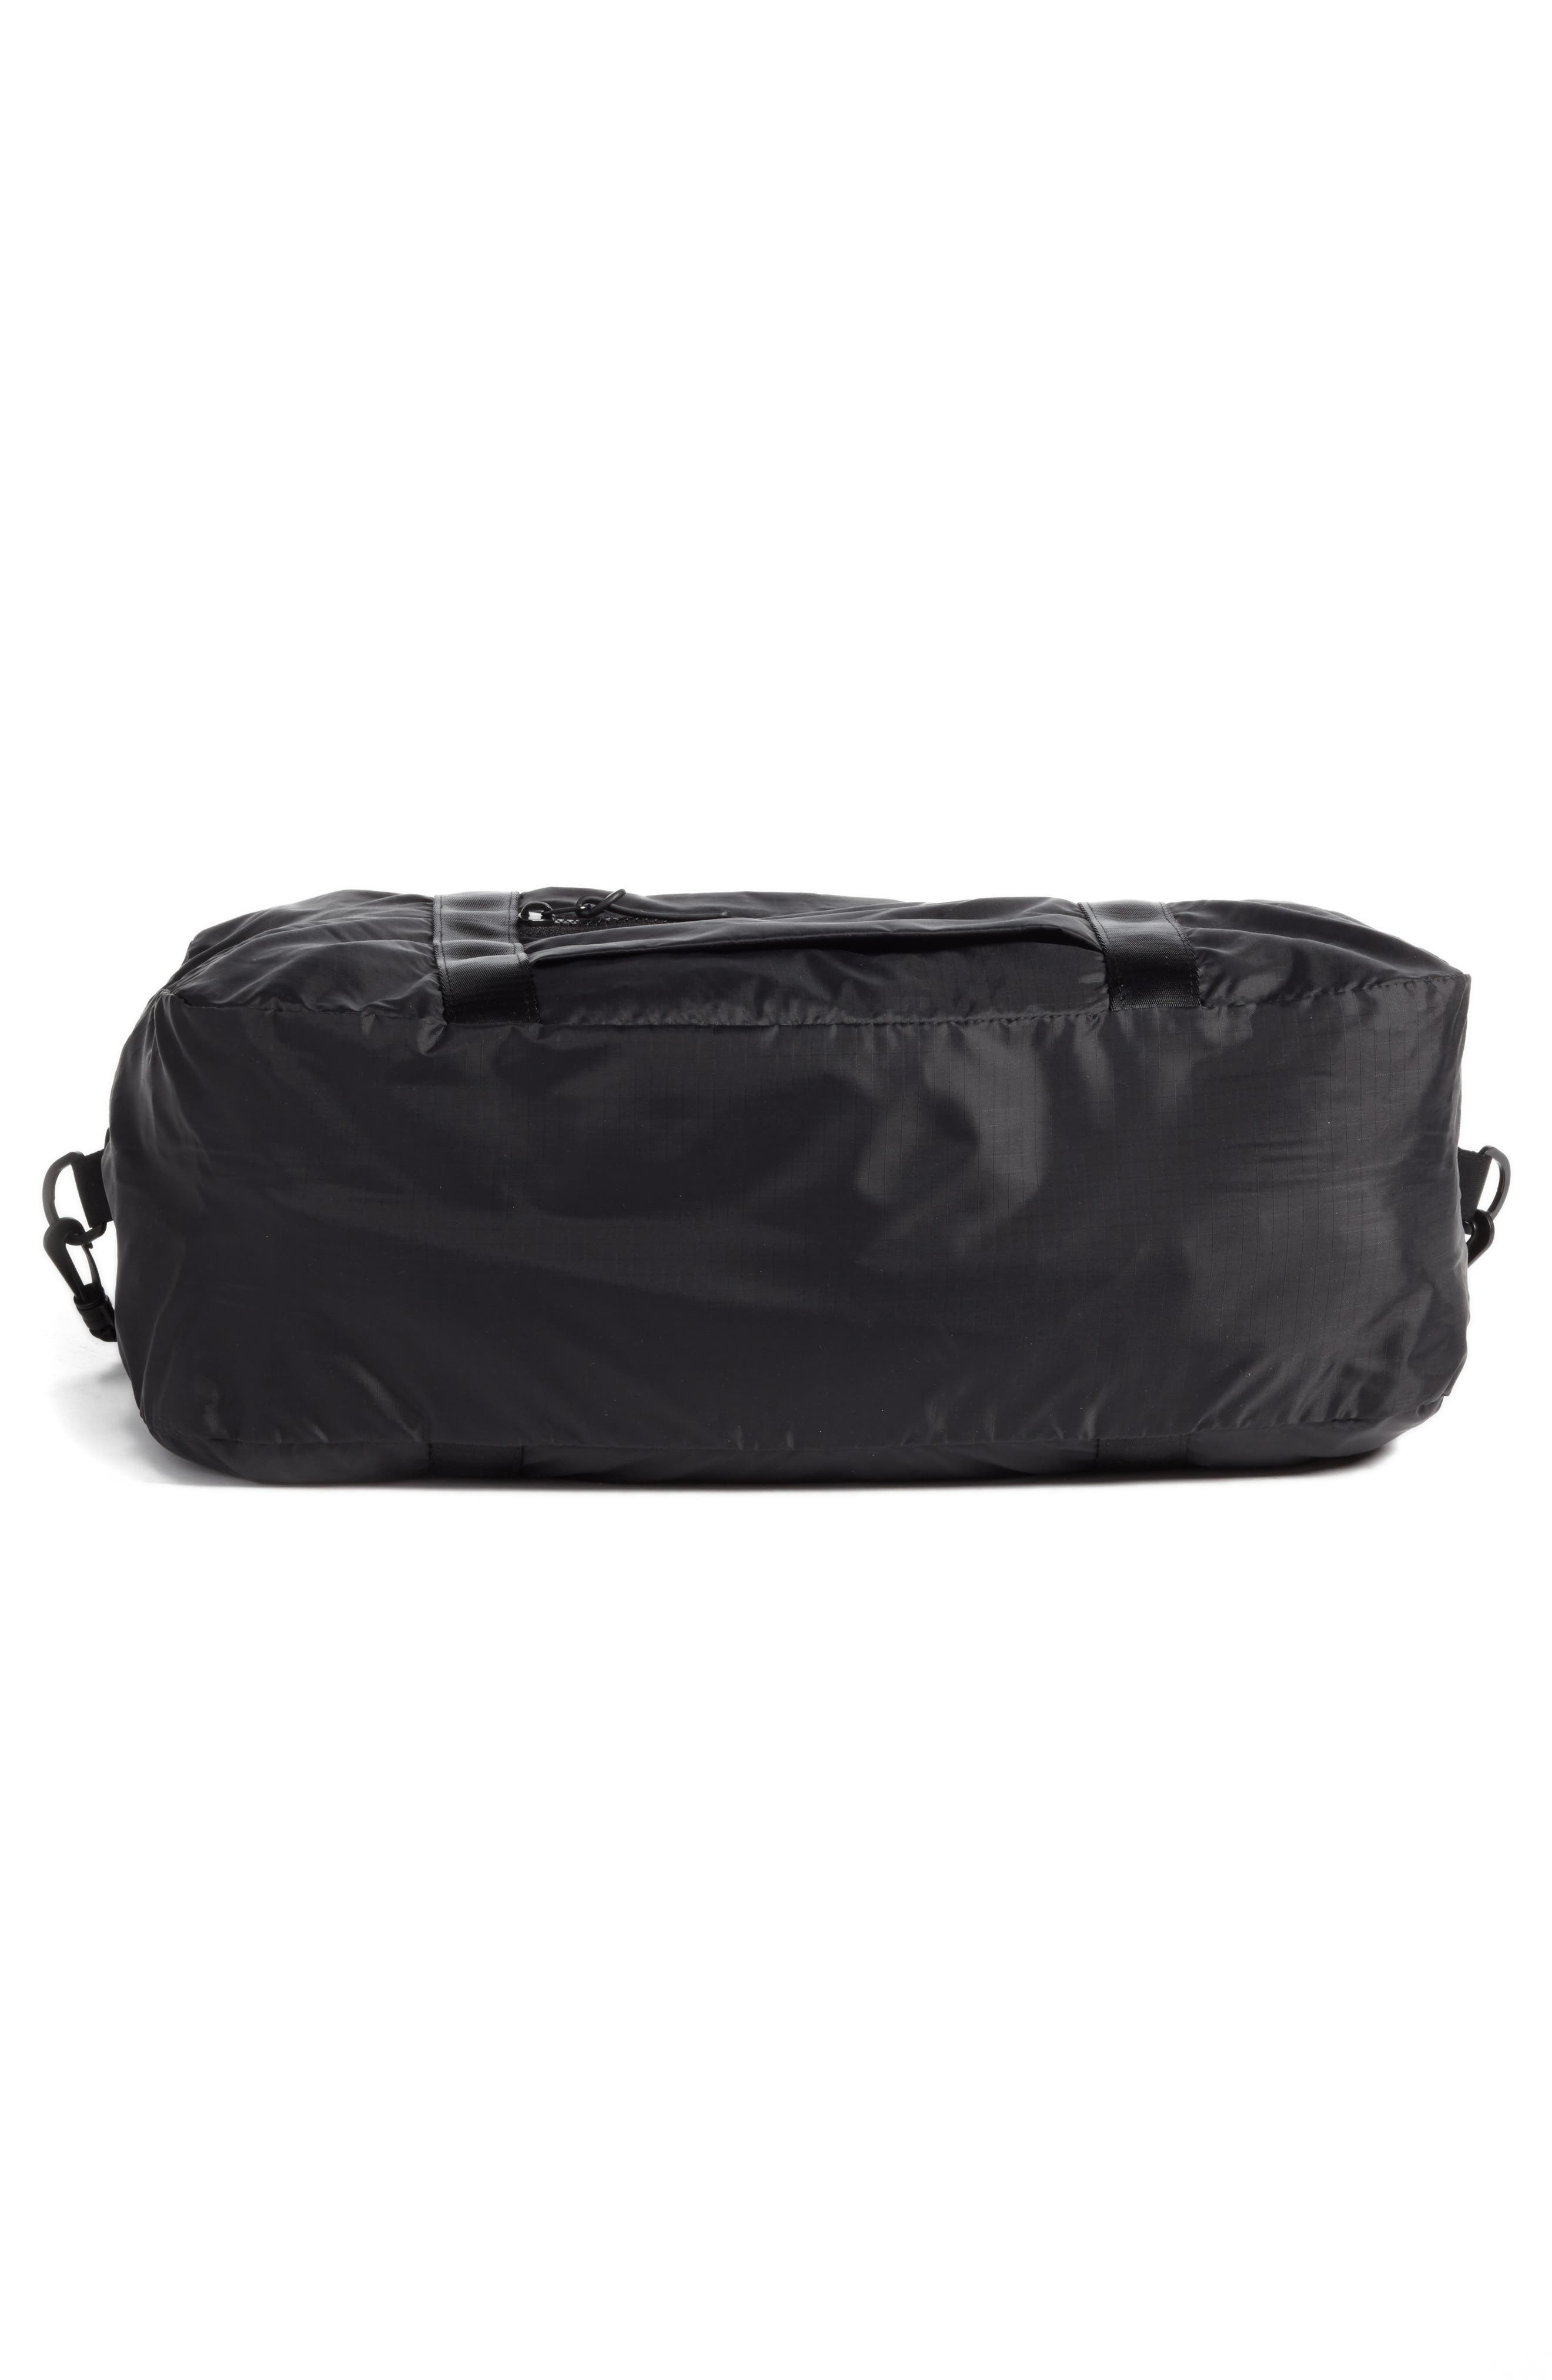 NORDSTROM, Packable Nylon Duffel Bag, Alternate thumbnail 7, color, BLACK